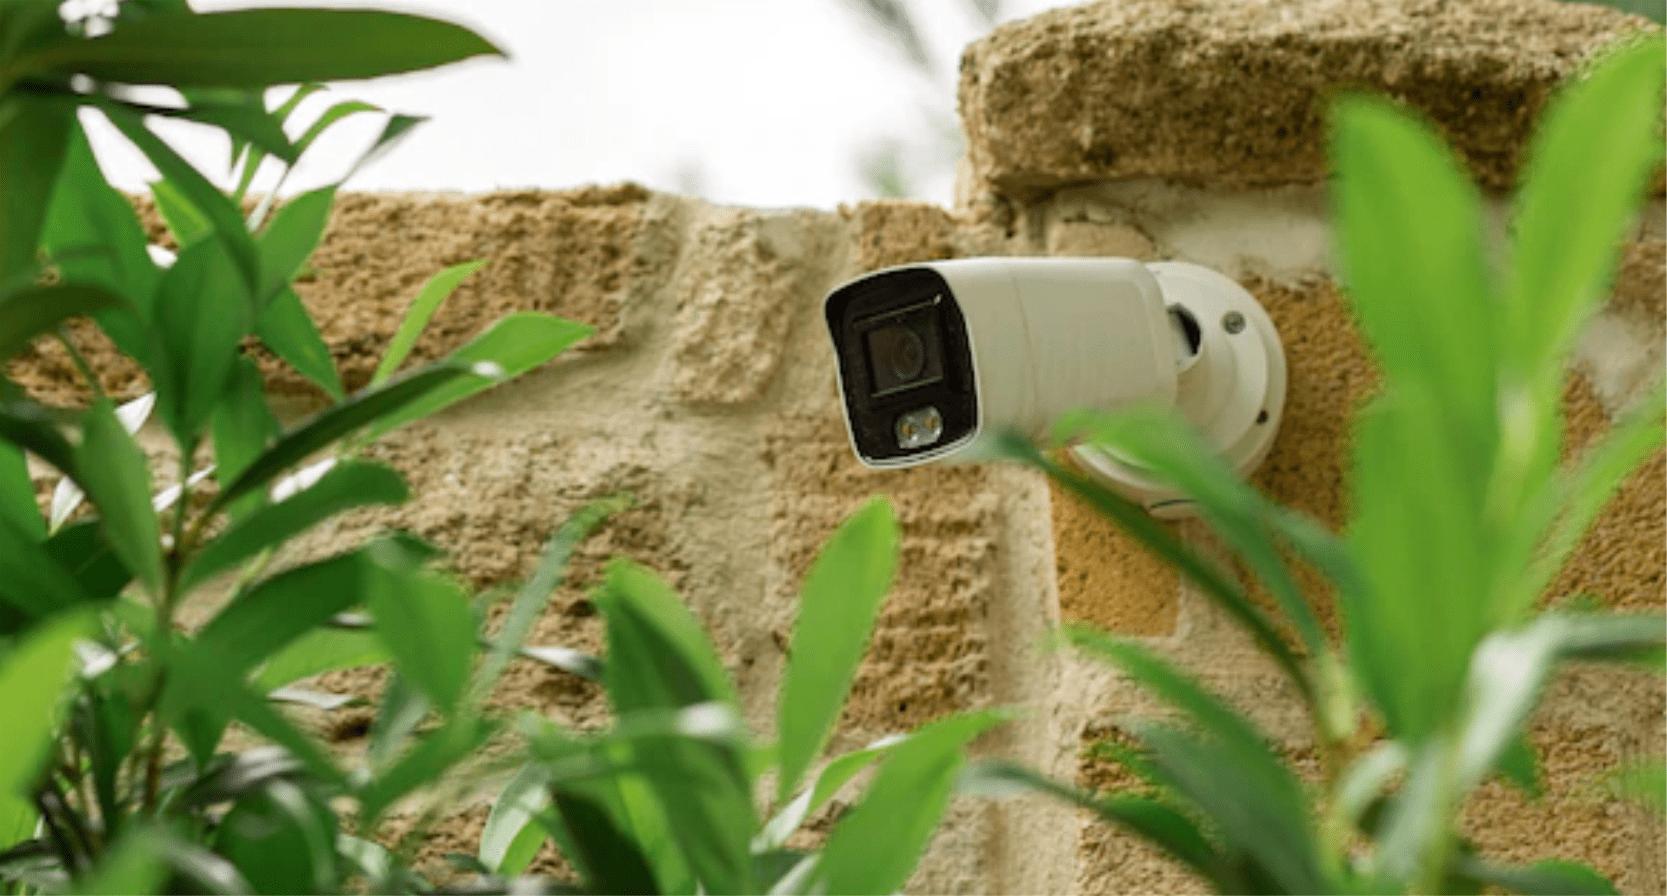 https://www.solavtec.com/wp-content/uploads/2015/12/campo_futbol.png